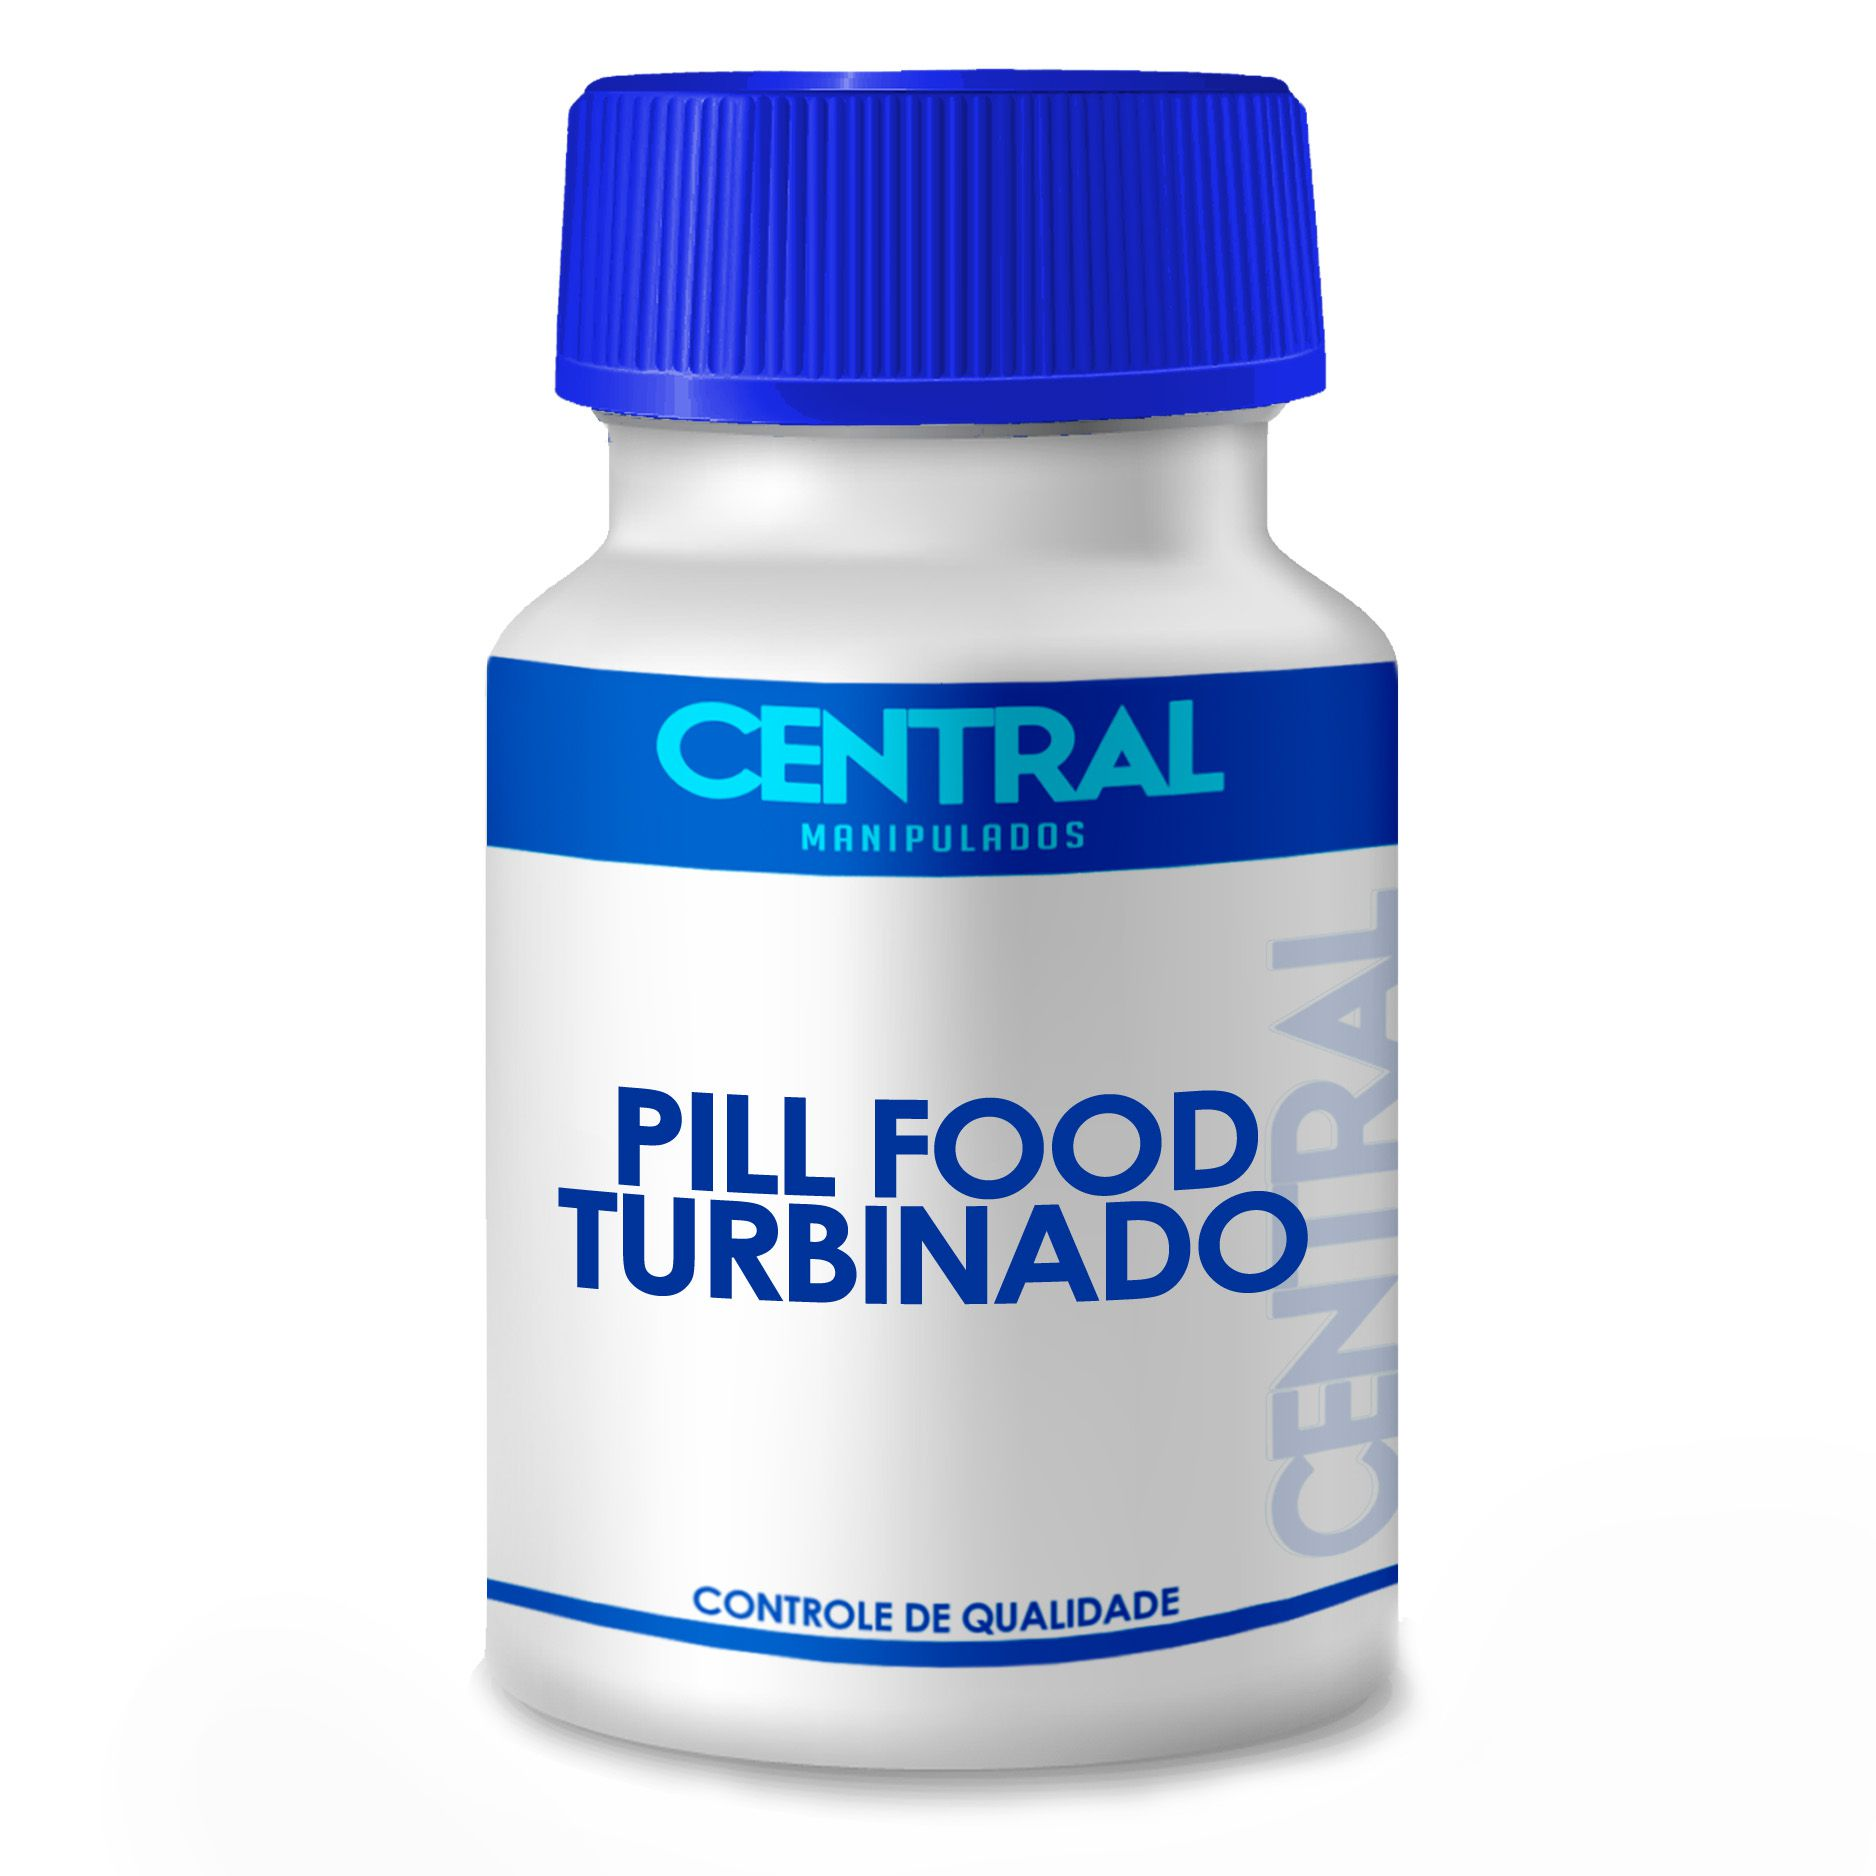 Pill Food Turbinado - complexo vitamínico - 120 cápsulas